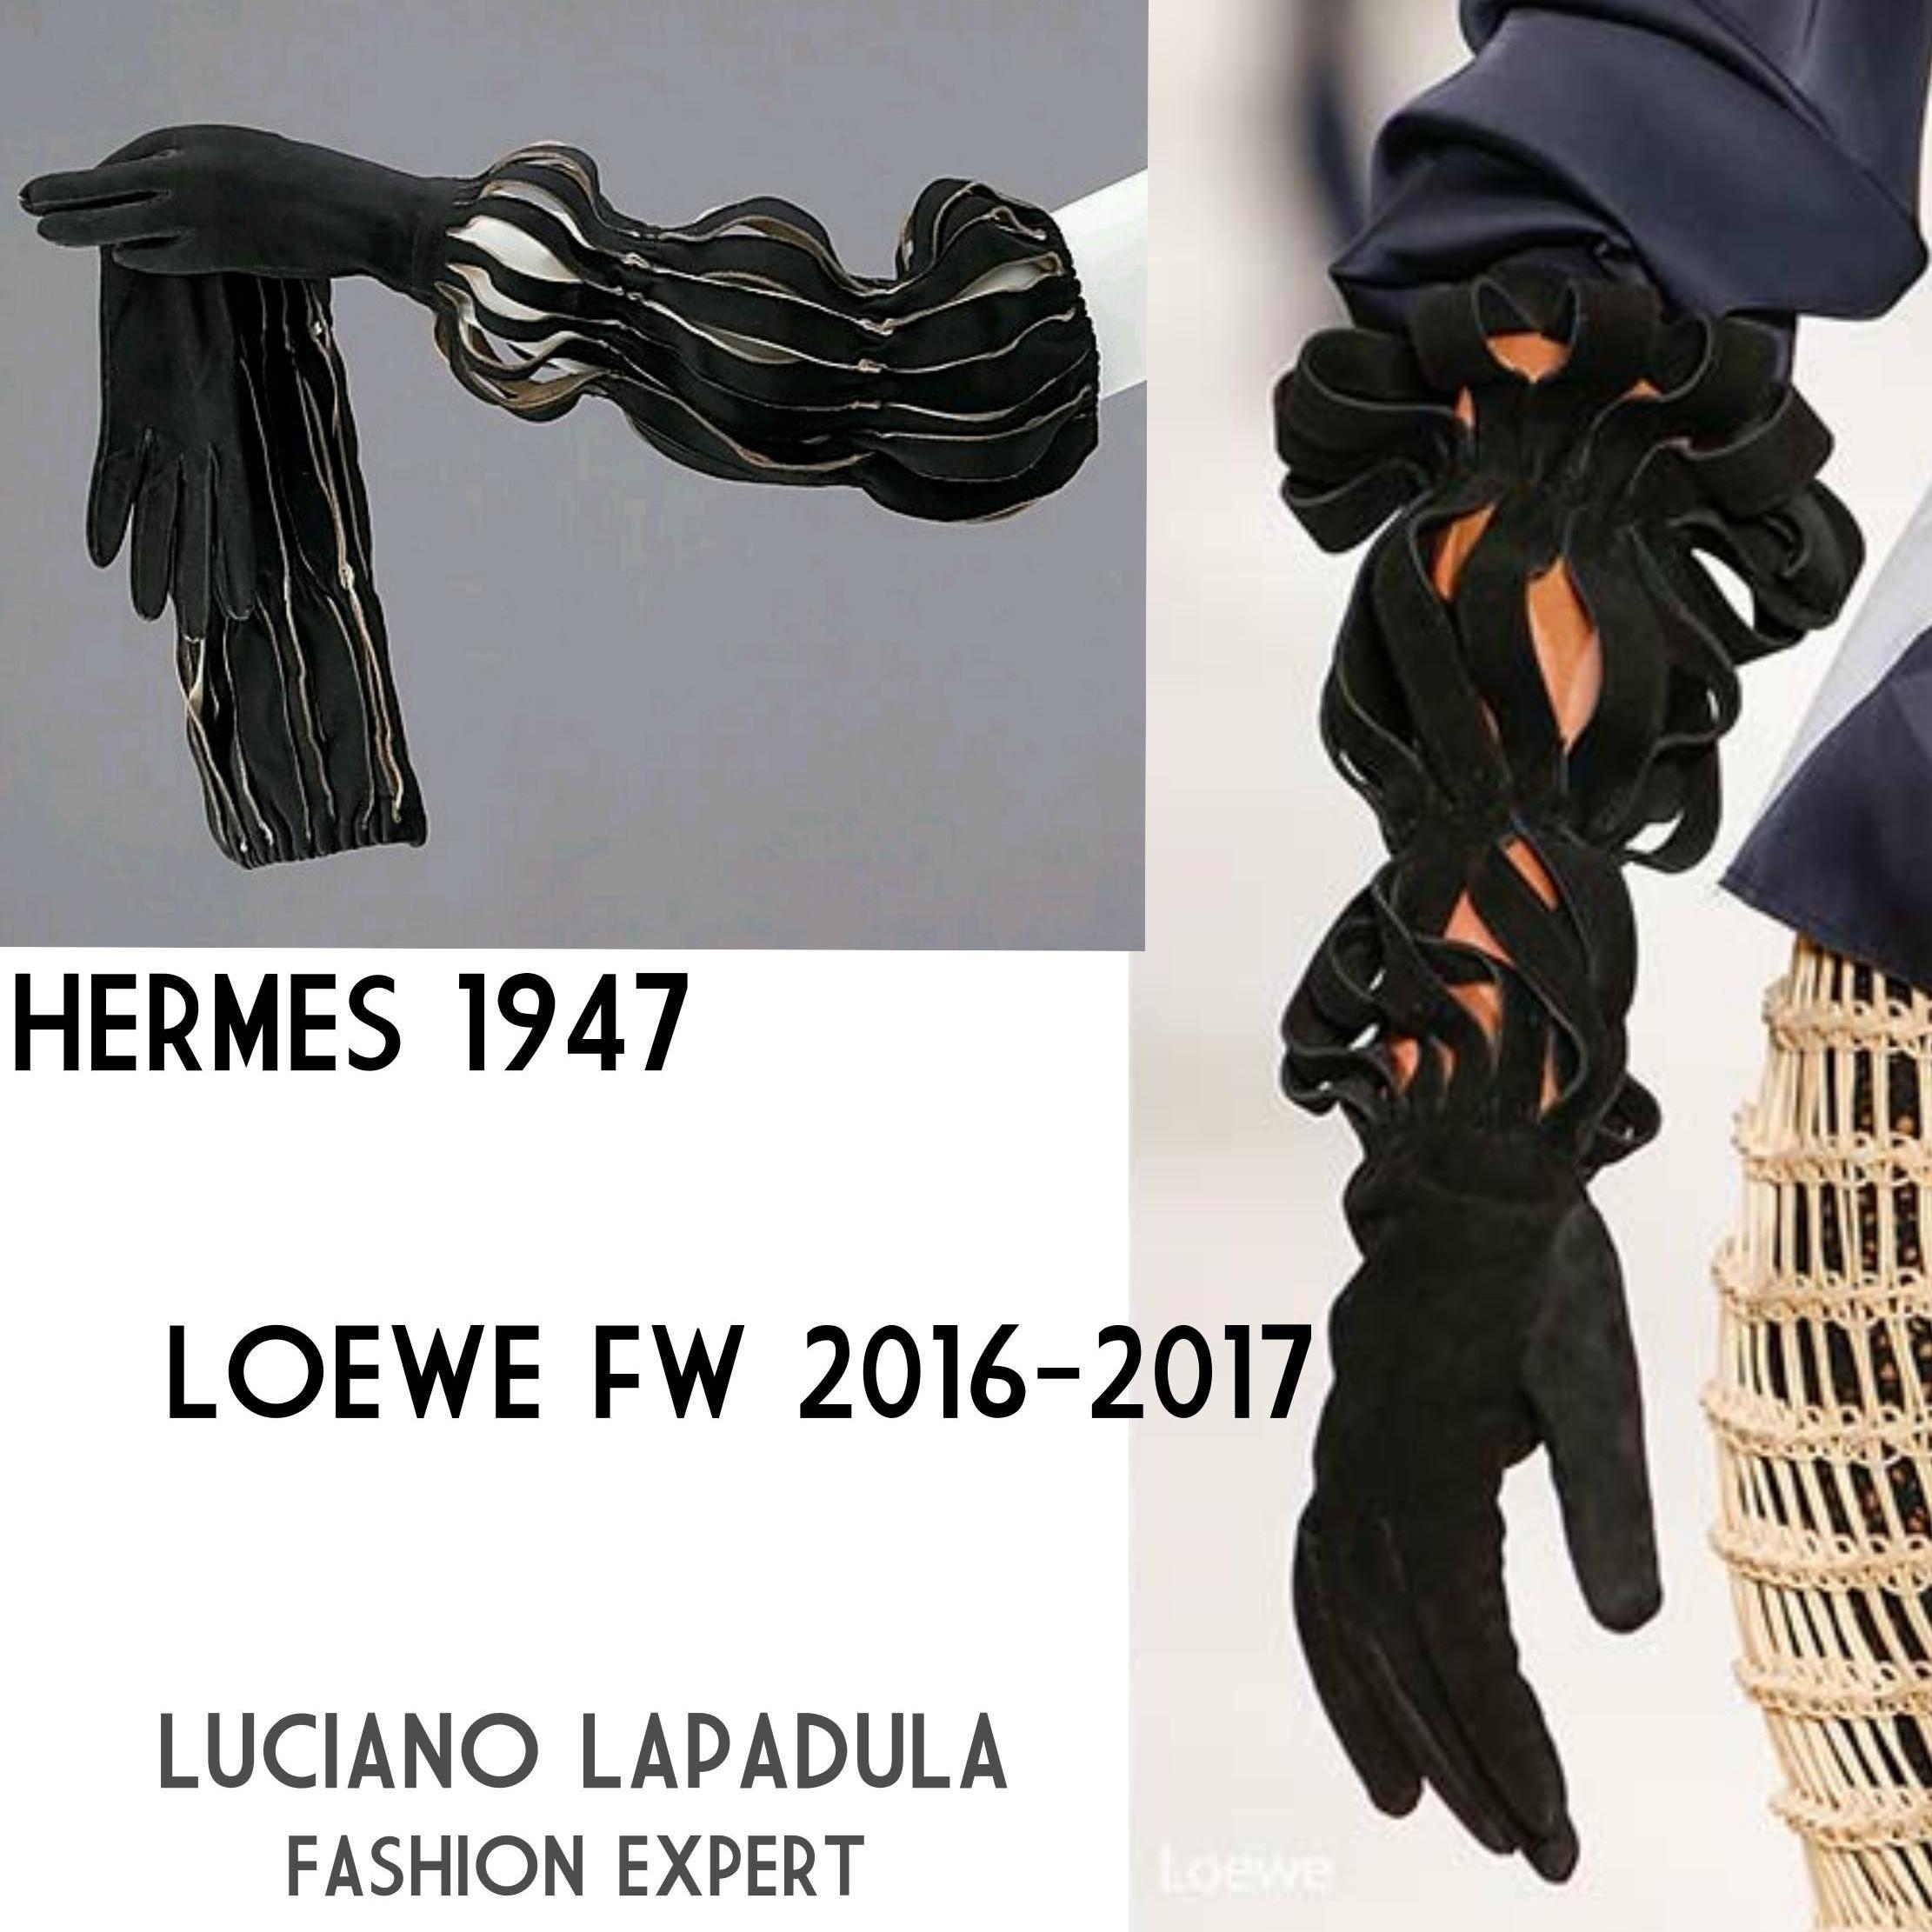 luciano-lapadula-fashion-historian-loewe-gloves-2016-2017-hermes-paris-40s-1947-copy-dress-museum-vogue-critic-instagram-wordpress-facebook-leraario-lapadula-blog-blogger-stylist-designer-art